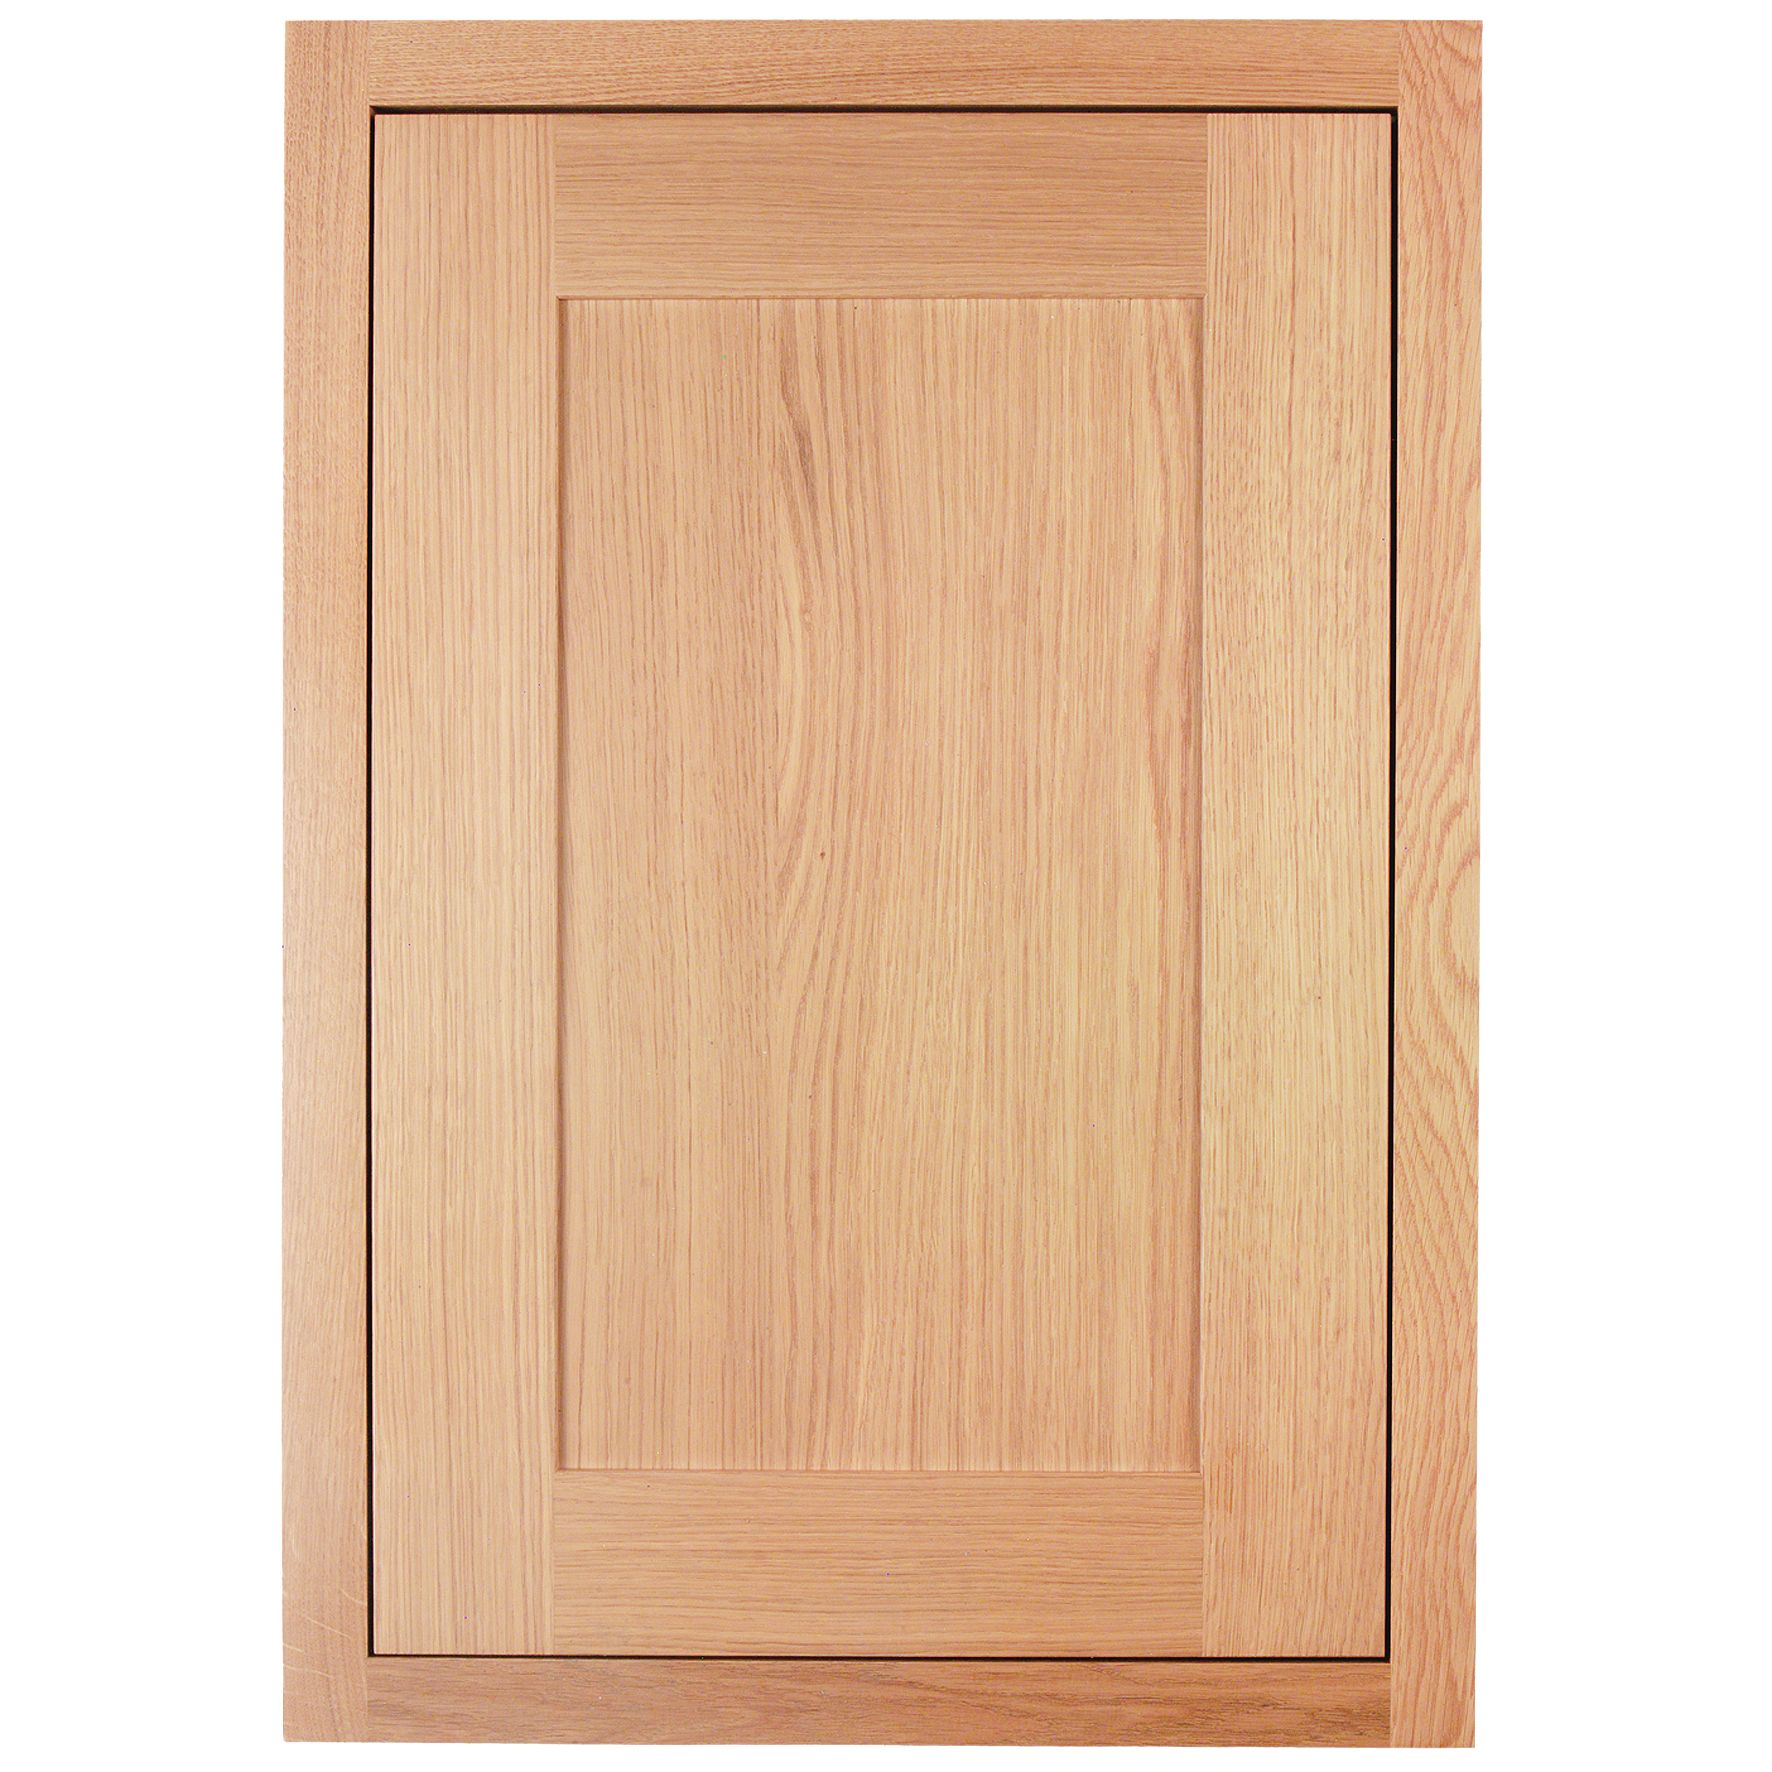 B Q Kitchen Cabinet Doors: Cooke & Lewis Carisbrooke Oak Framed Standard Door (W